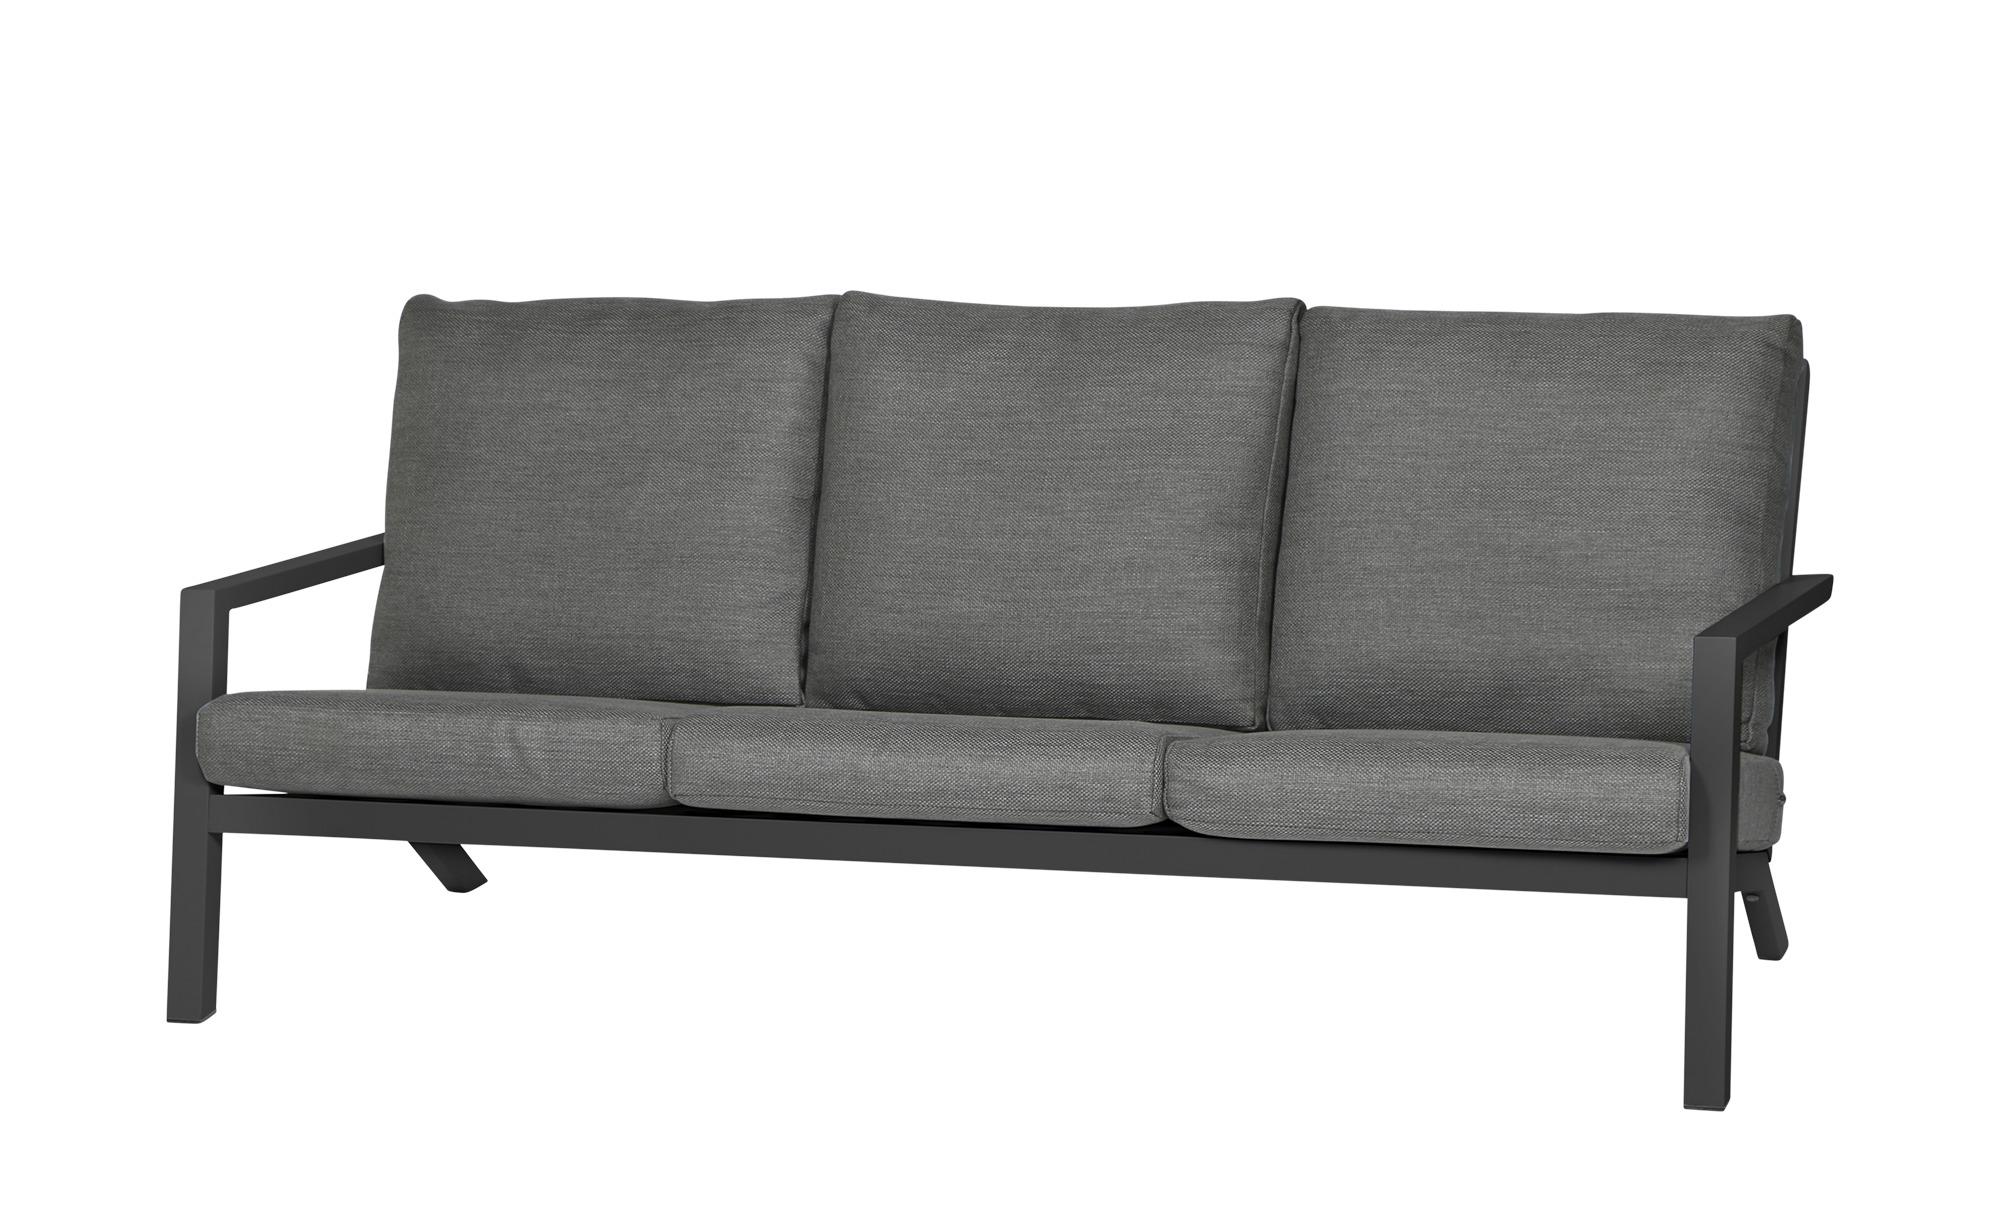 Lounge-Sofa   Belia ¦ grau Garten > Gartenmöbel > Gartenbänke - Höffner | Garten | Grau | Möbel Höffner DE